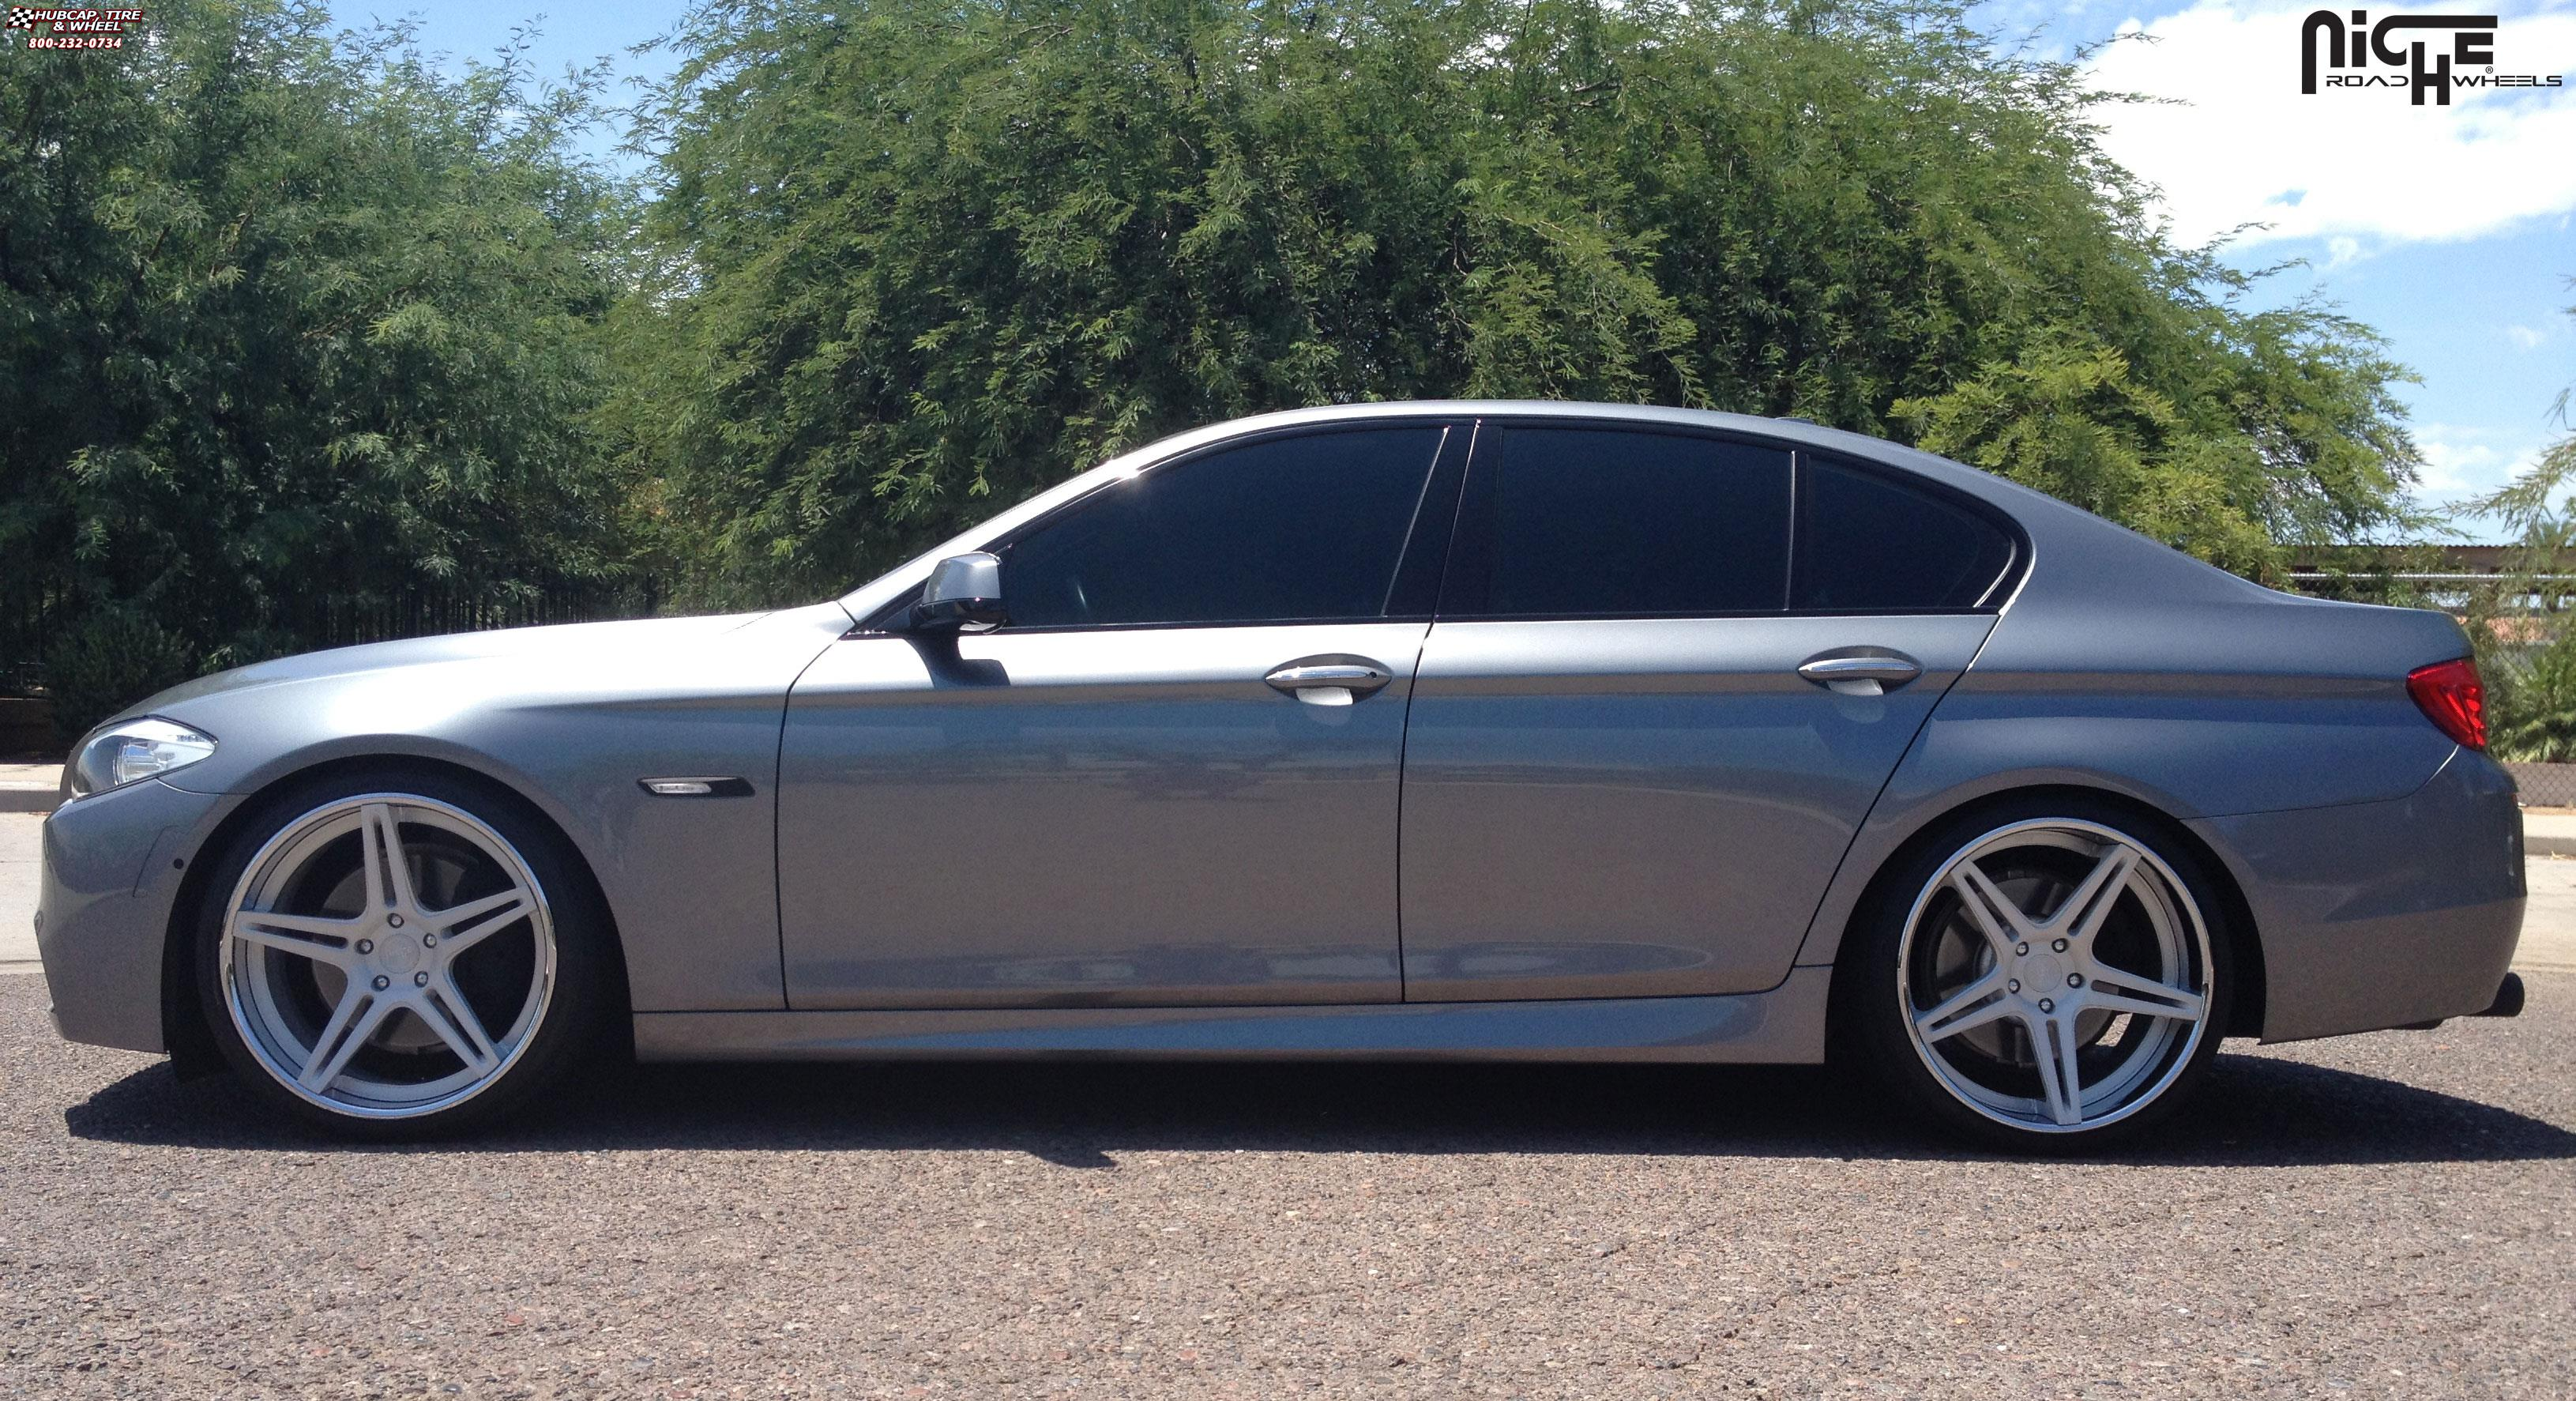 Bmw 335i Convertible >> BMW 550i Niche Sportiva - M207 Wheels Brushed   Hi Luster Polished Lip